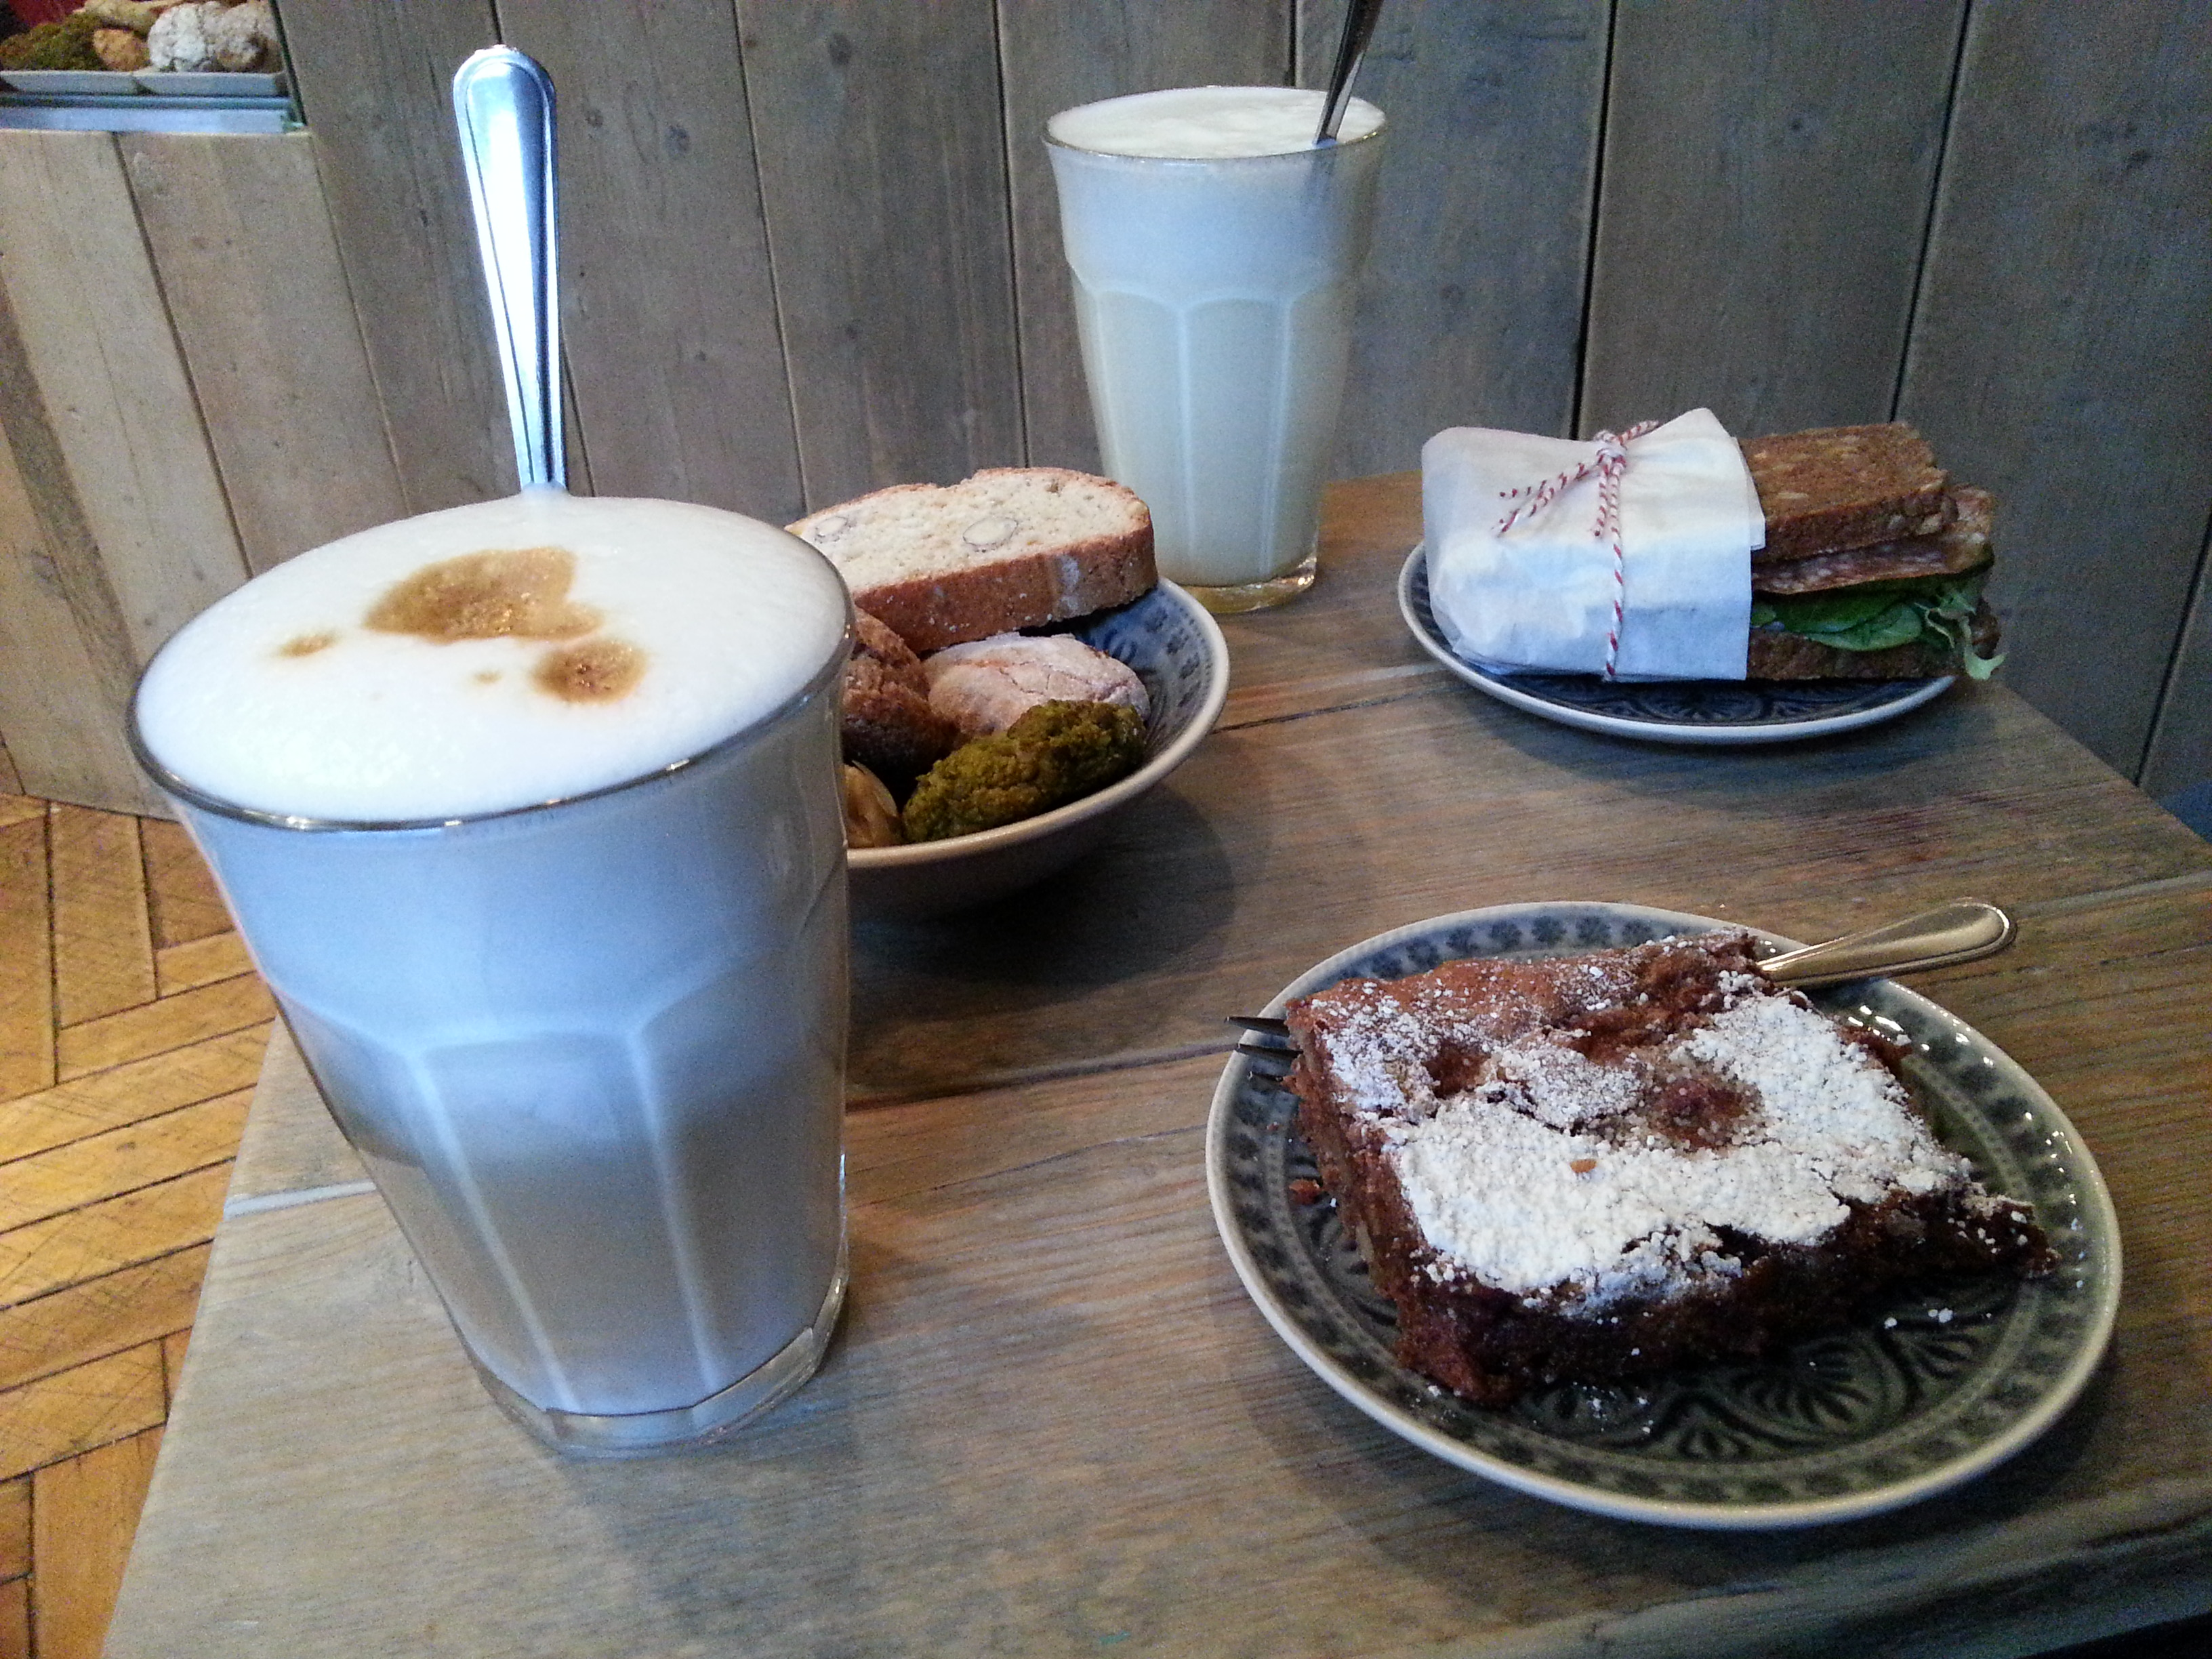 Latte Macchiato, Kekse, Sandwich und Kirschbrownies